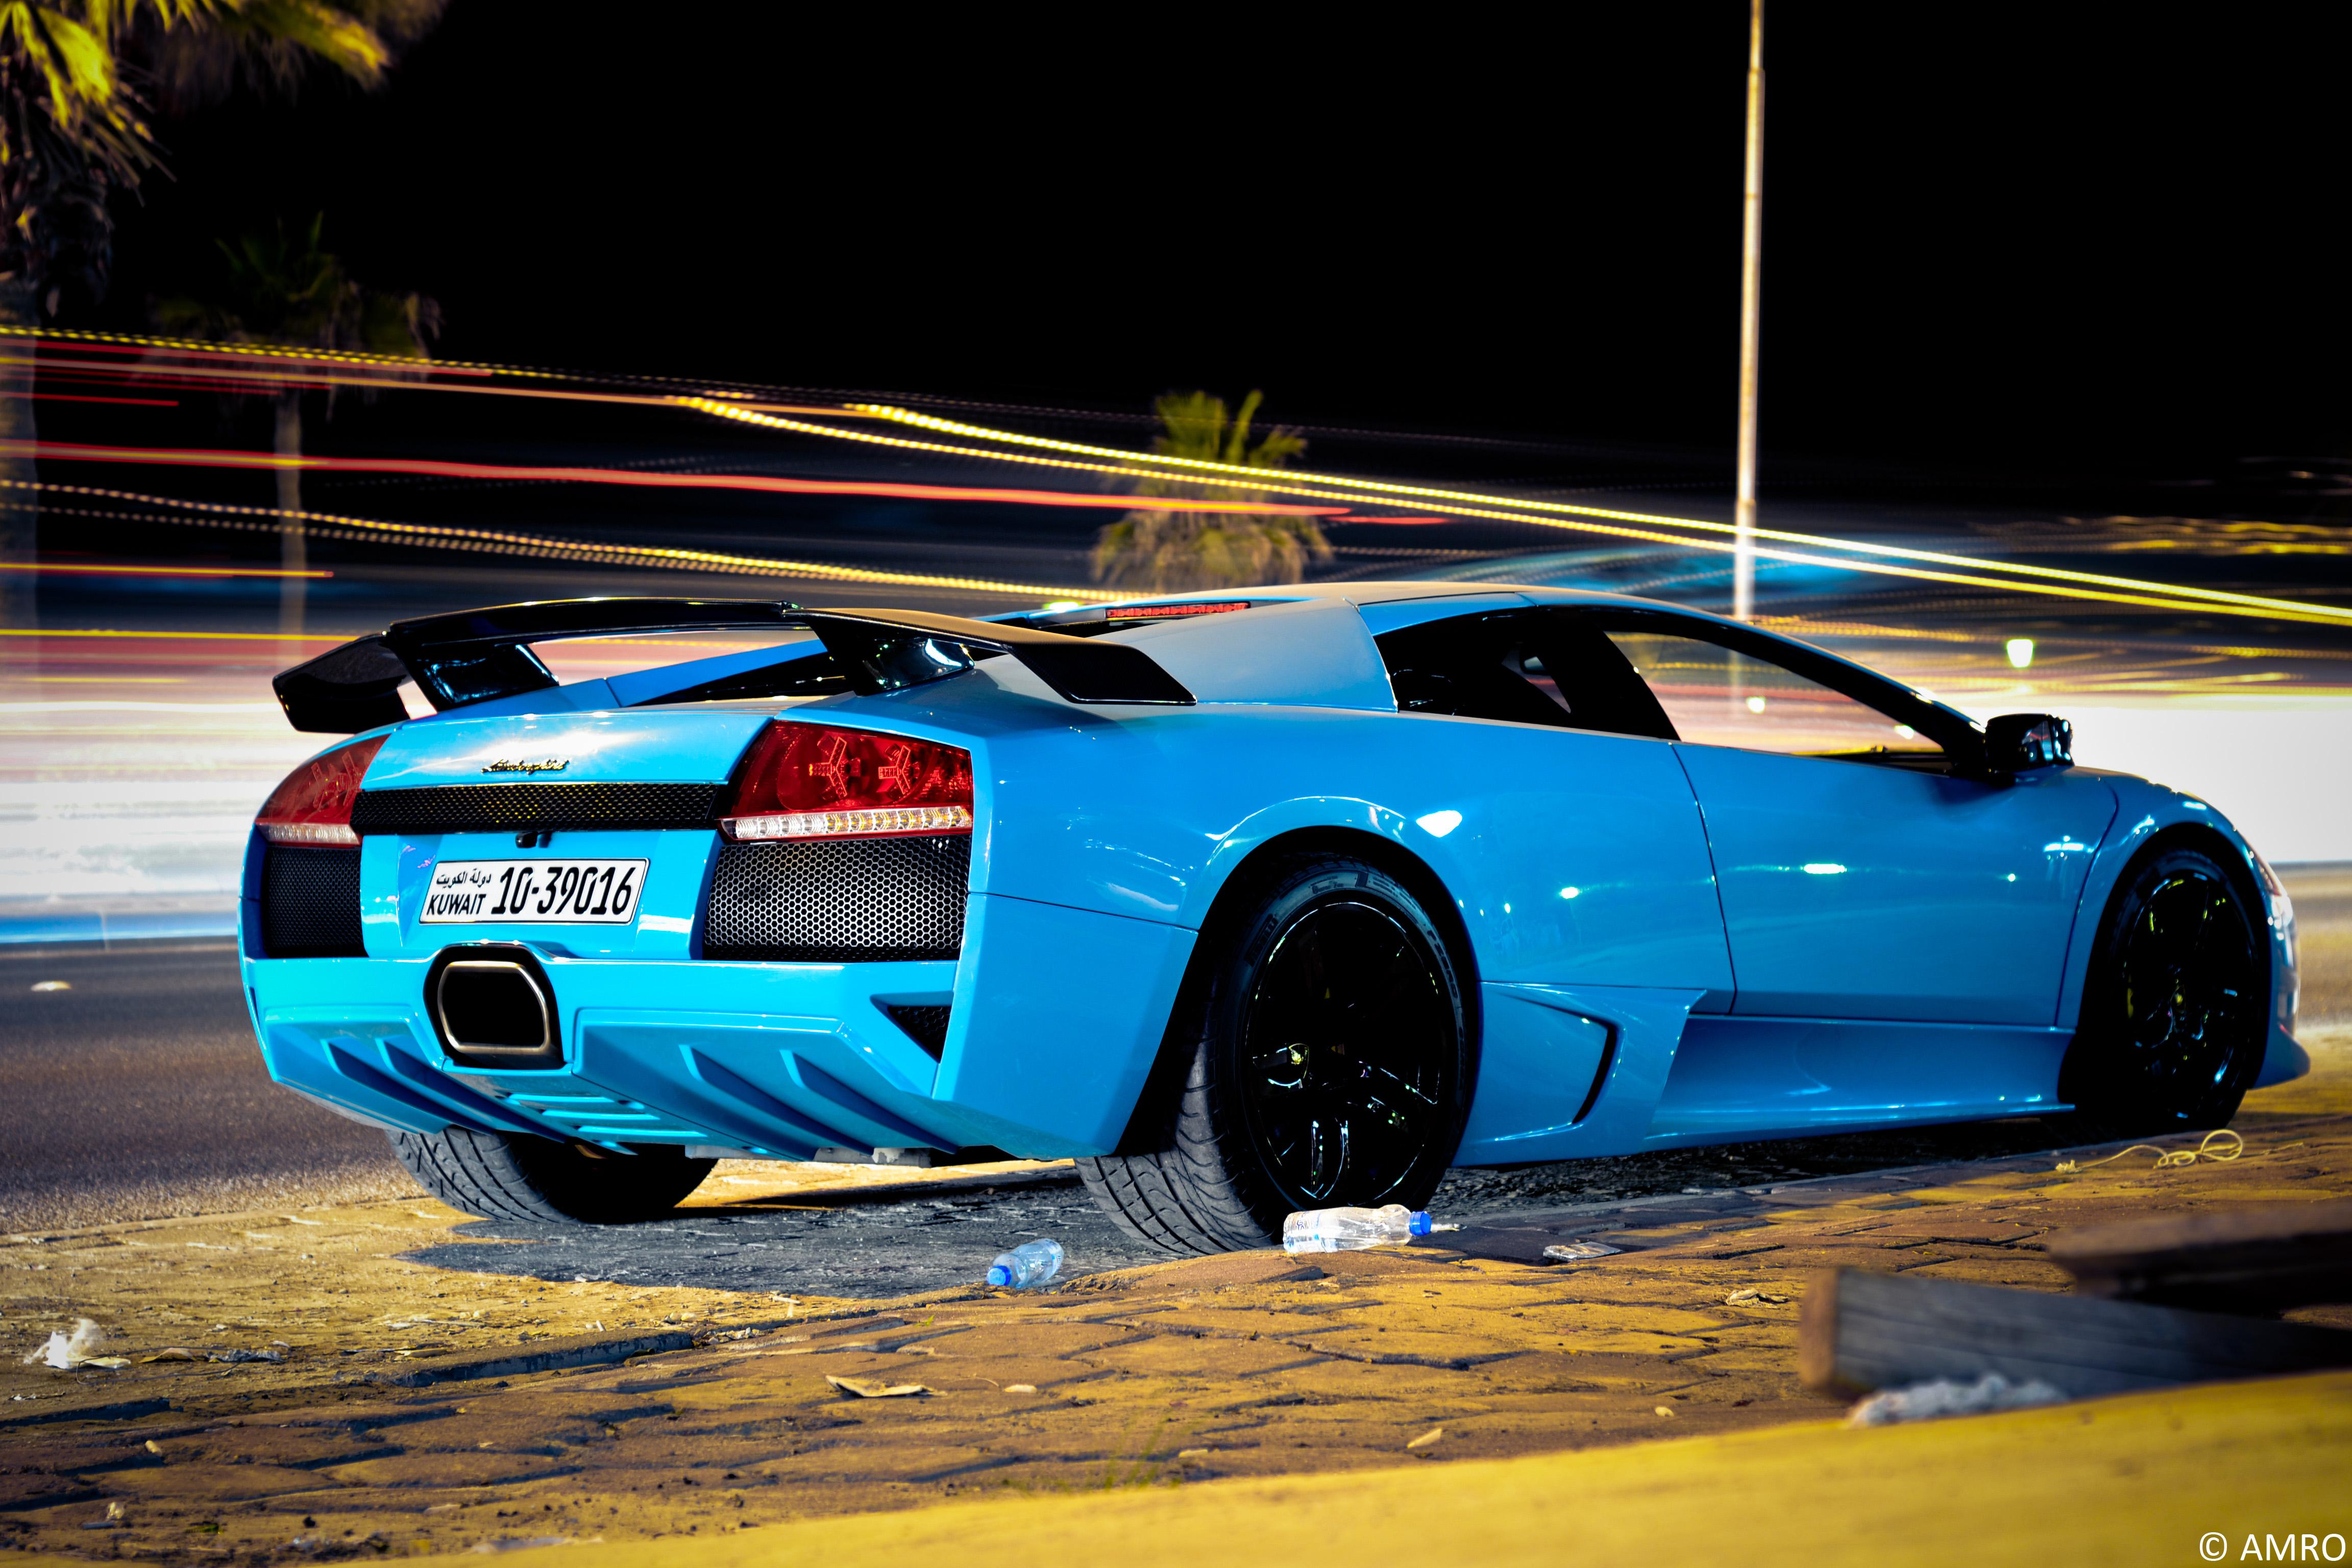 Papel De Parede Noite Carro Fotografia Azul Lamborghini